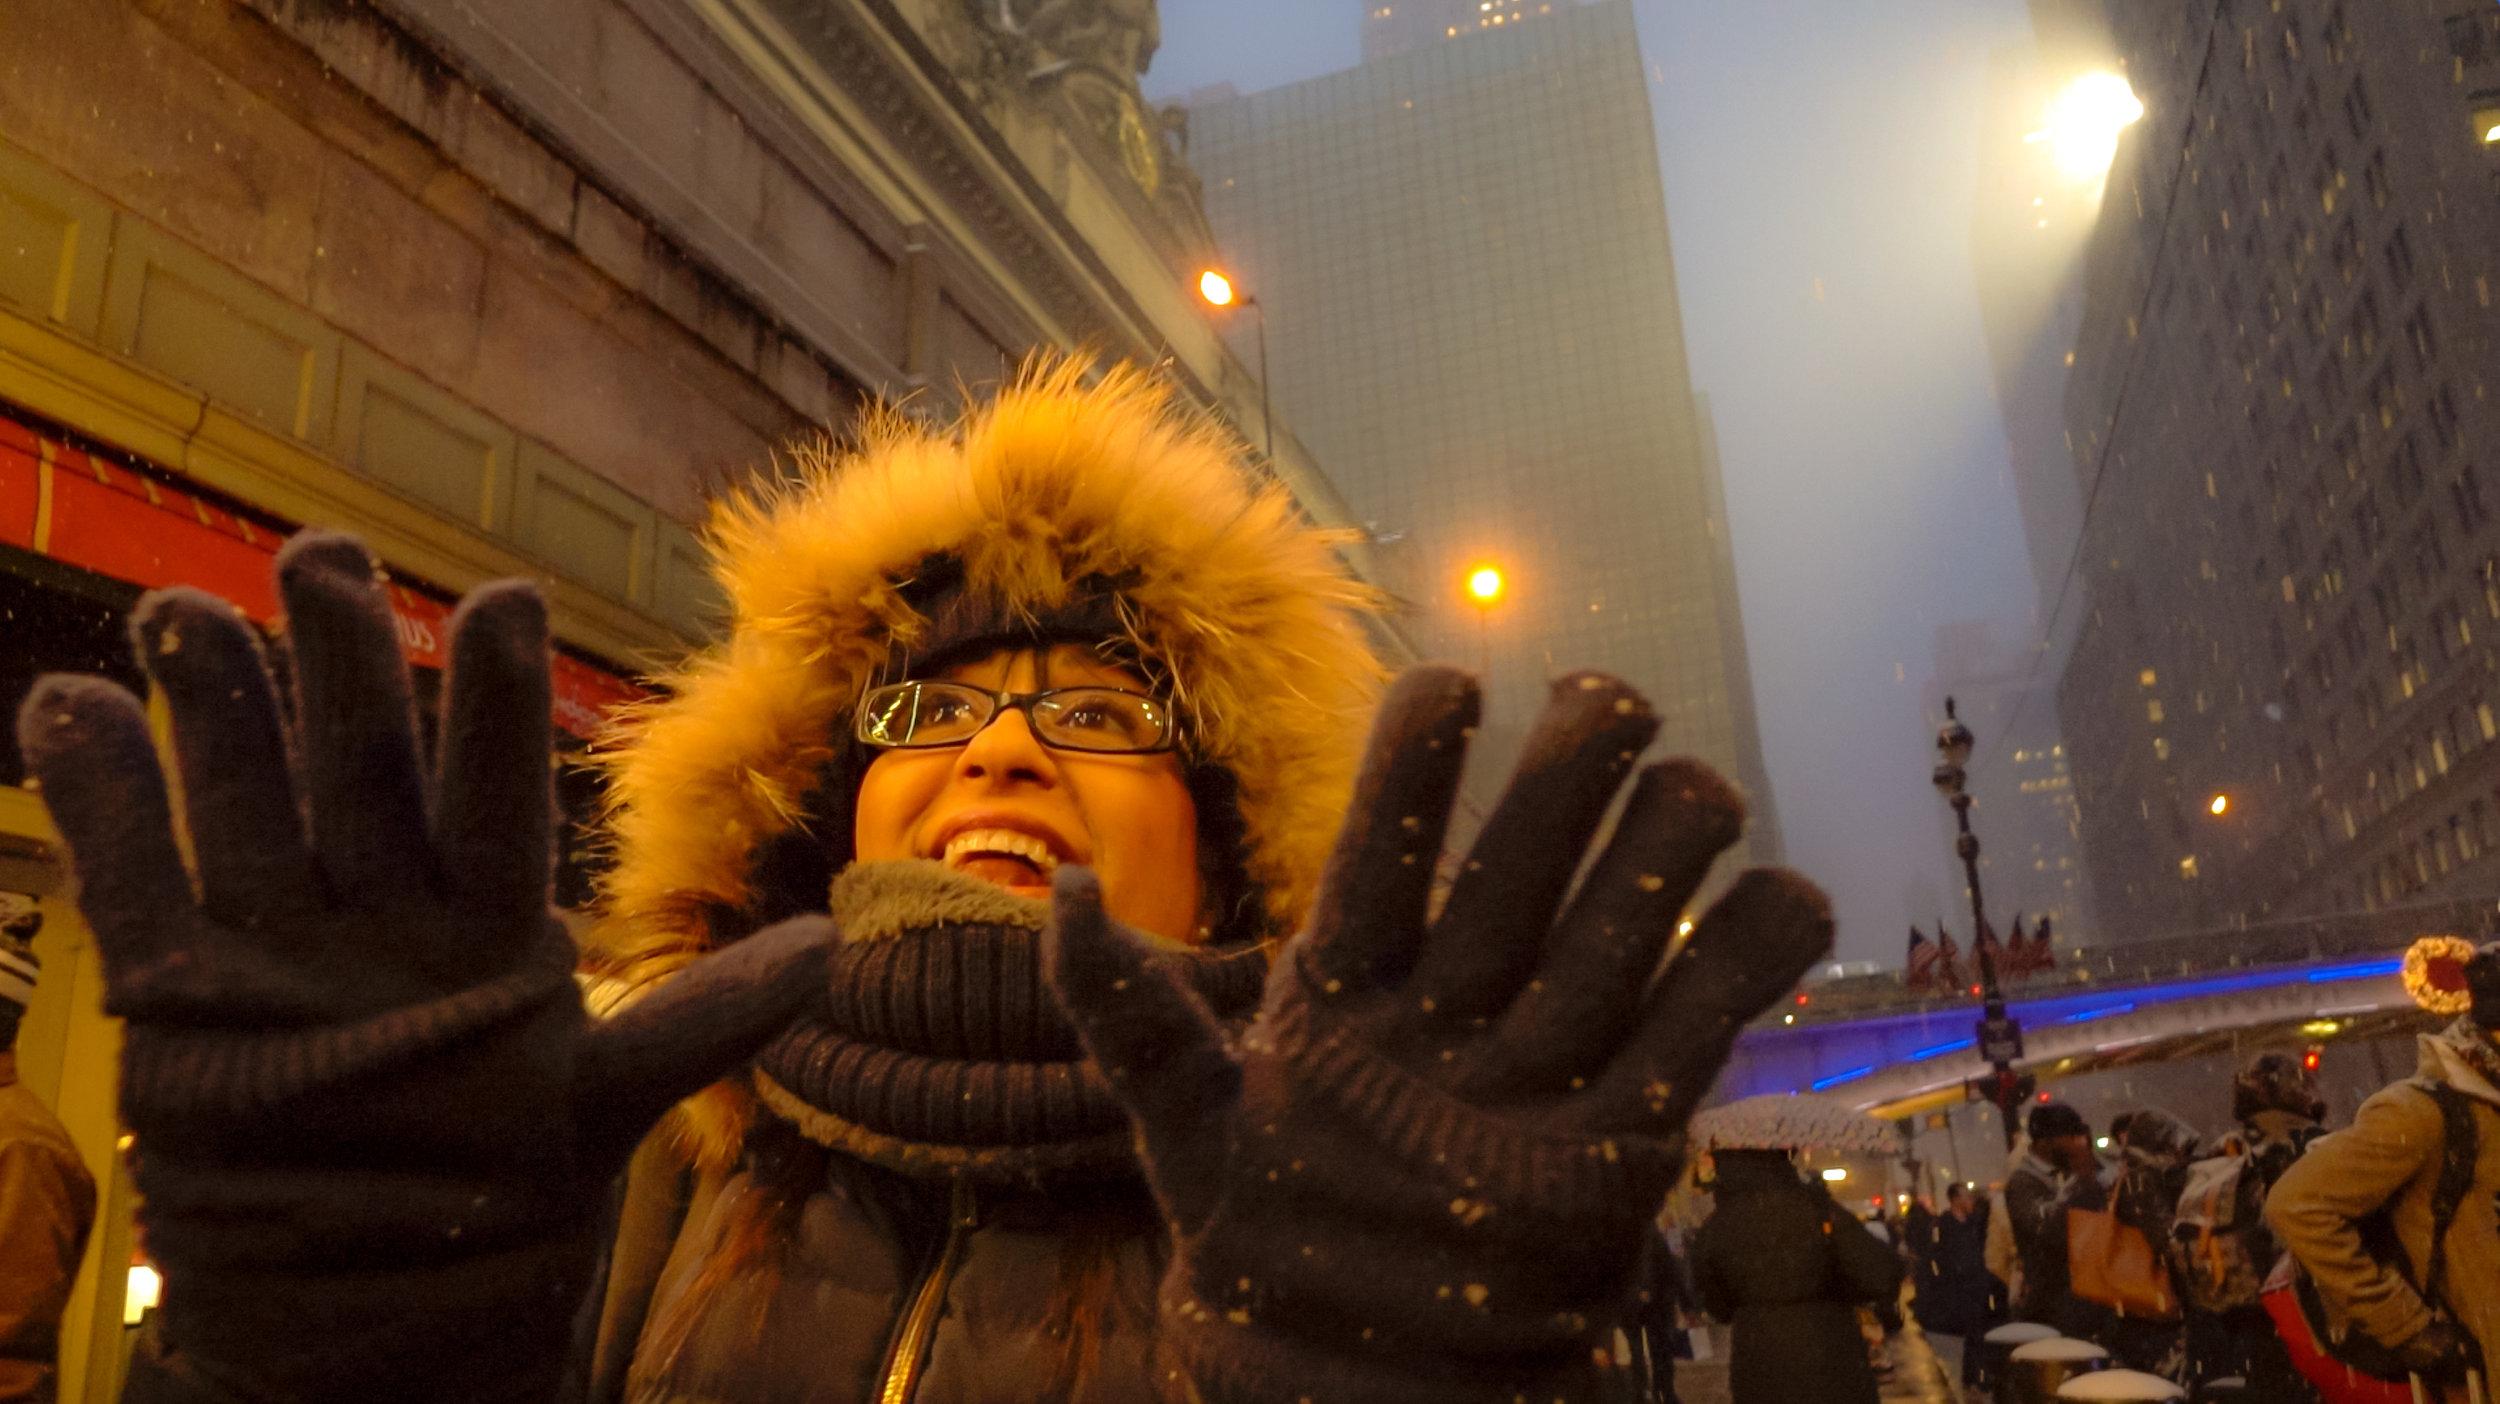 LA Piccola Italiana enjoying snow in front of Grand Central Terminal